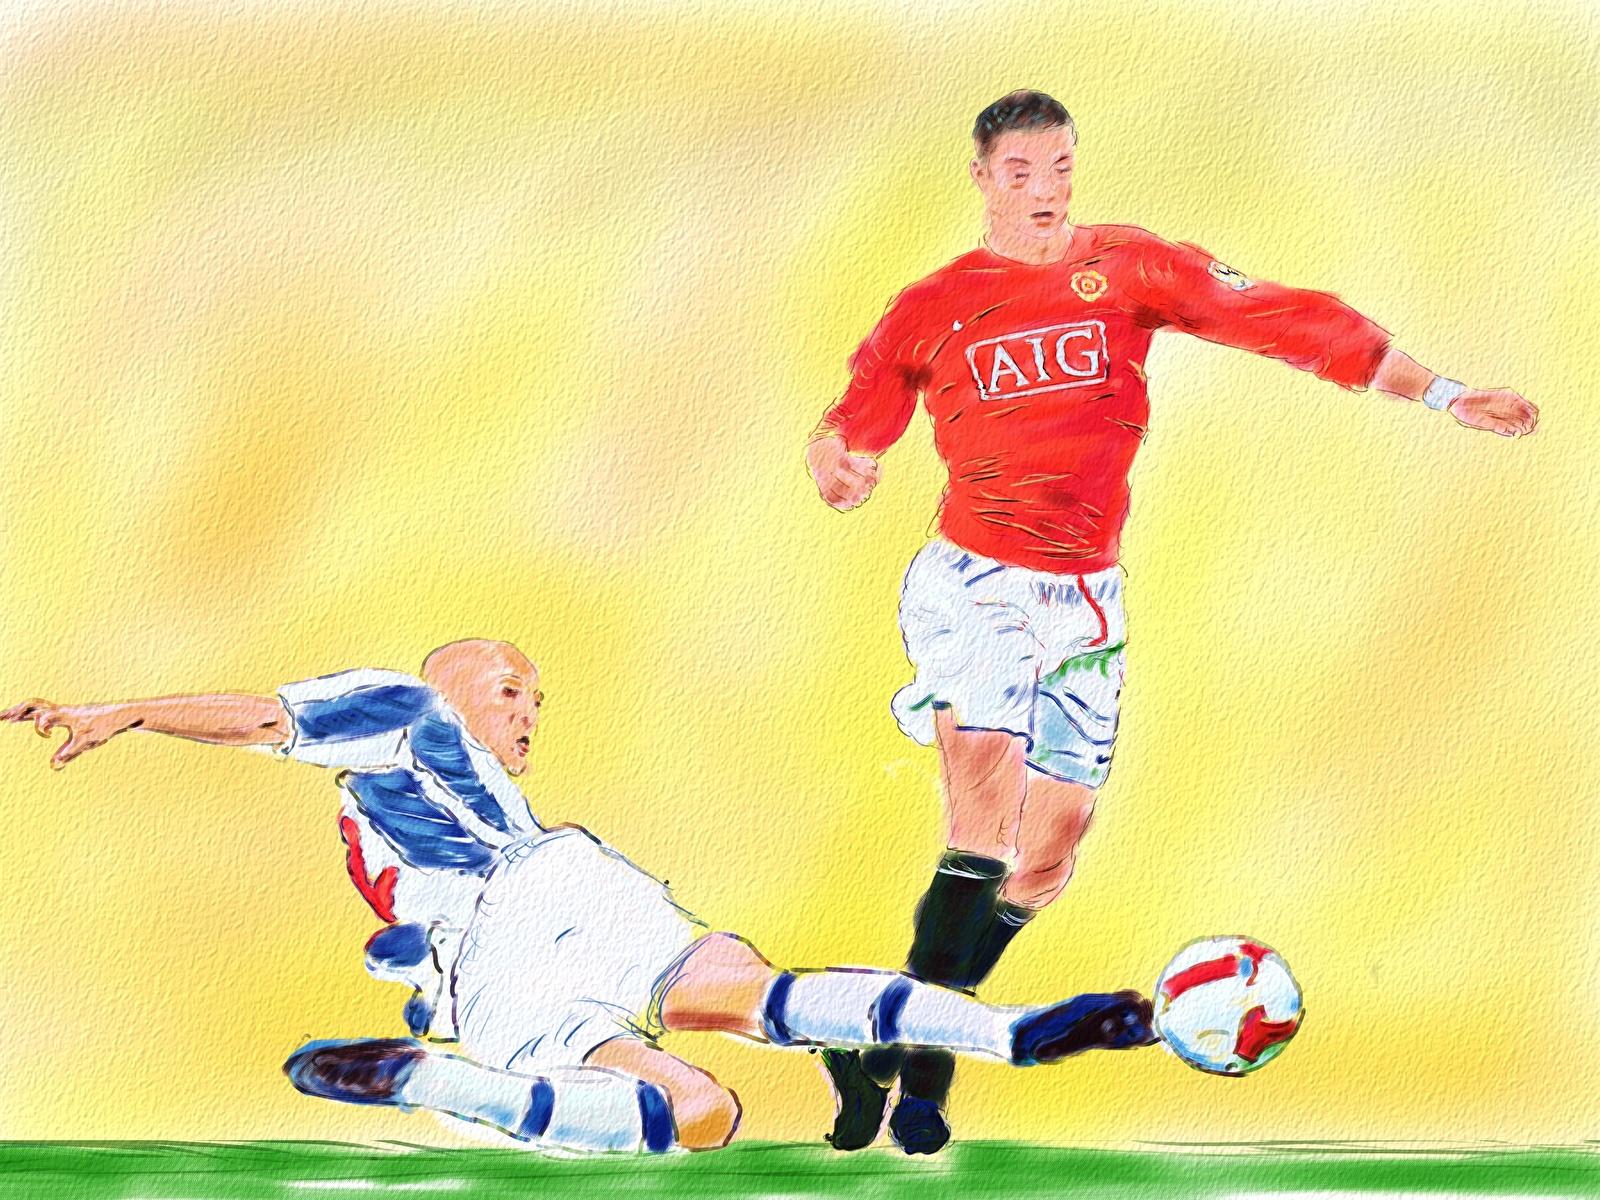 Foto The Tackle Ronaldo Manchester United 2 Fussball 1600x1200